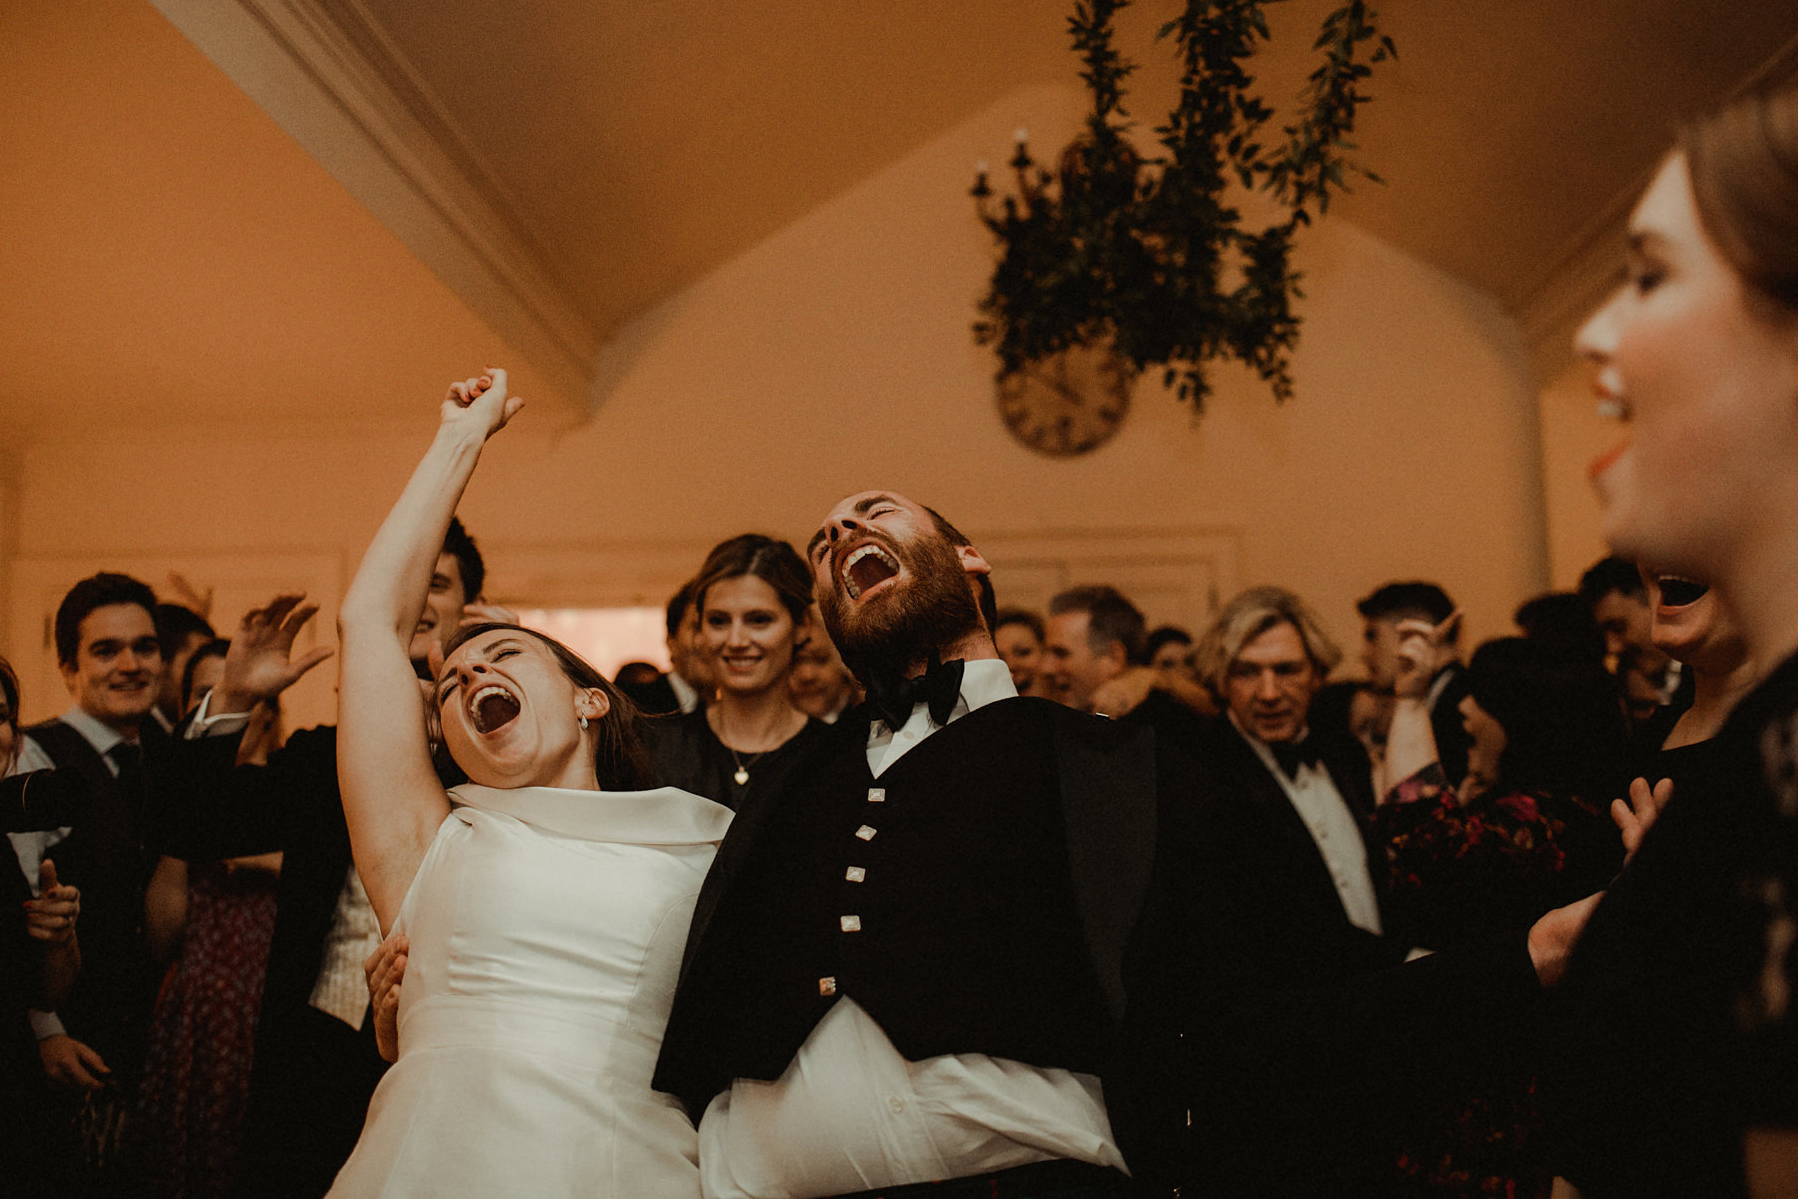 Alternative_wedding_photographer_scotland_nikki_leadbetter-2.jpg